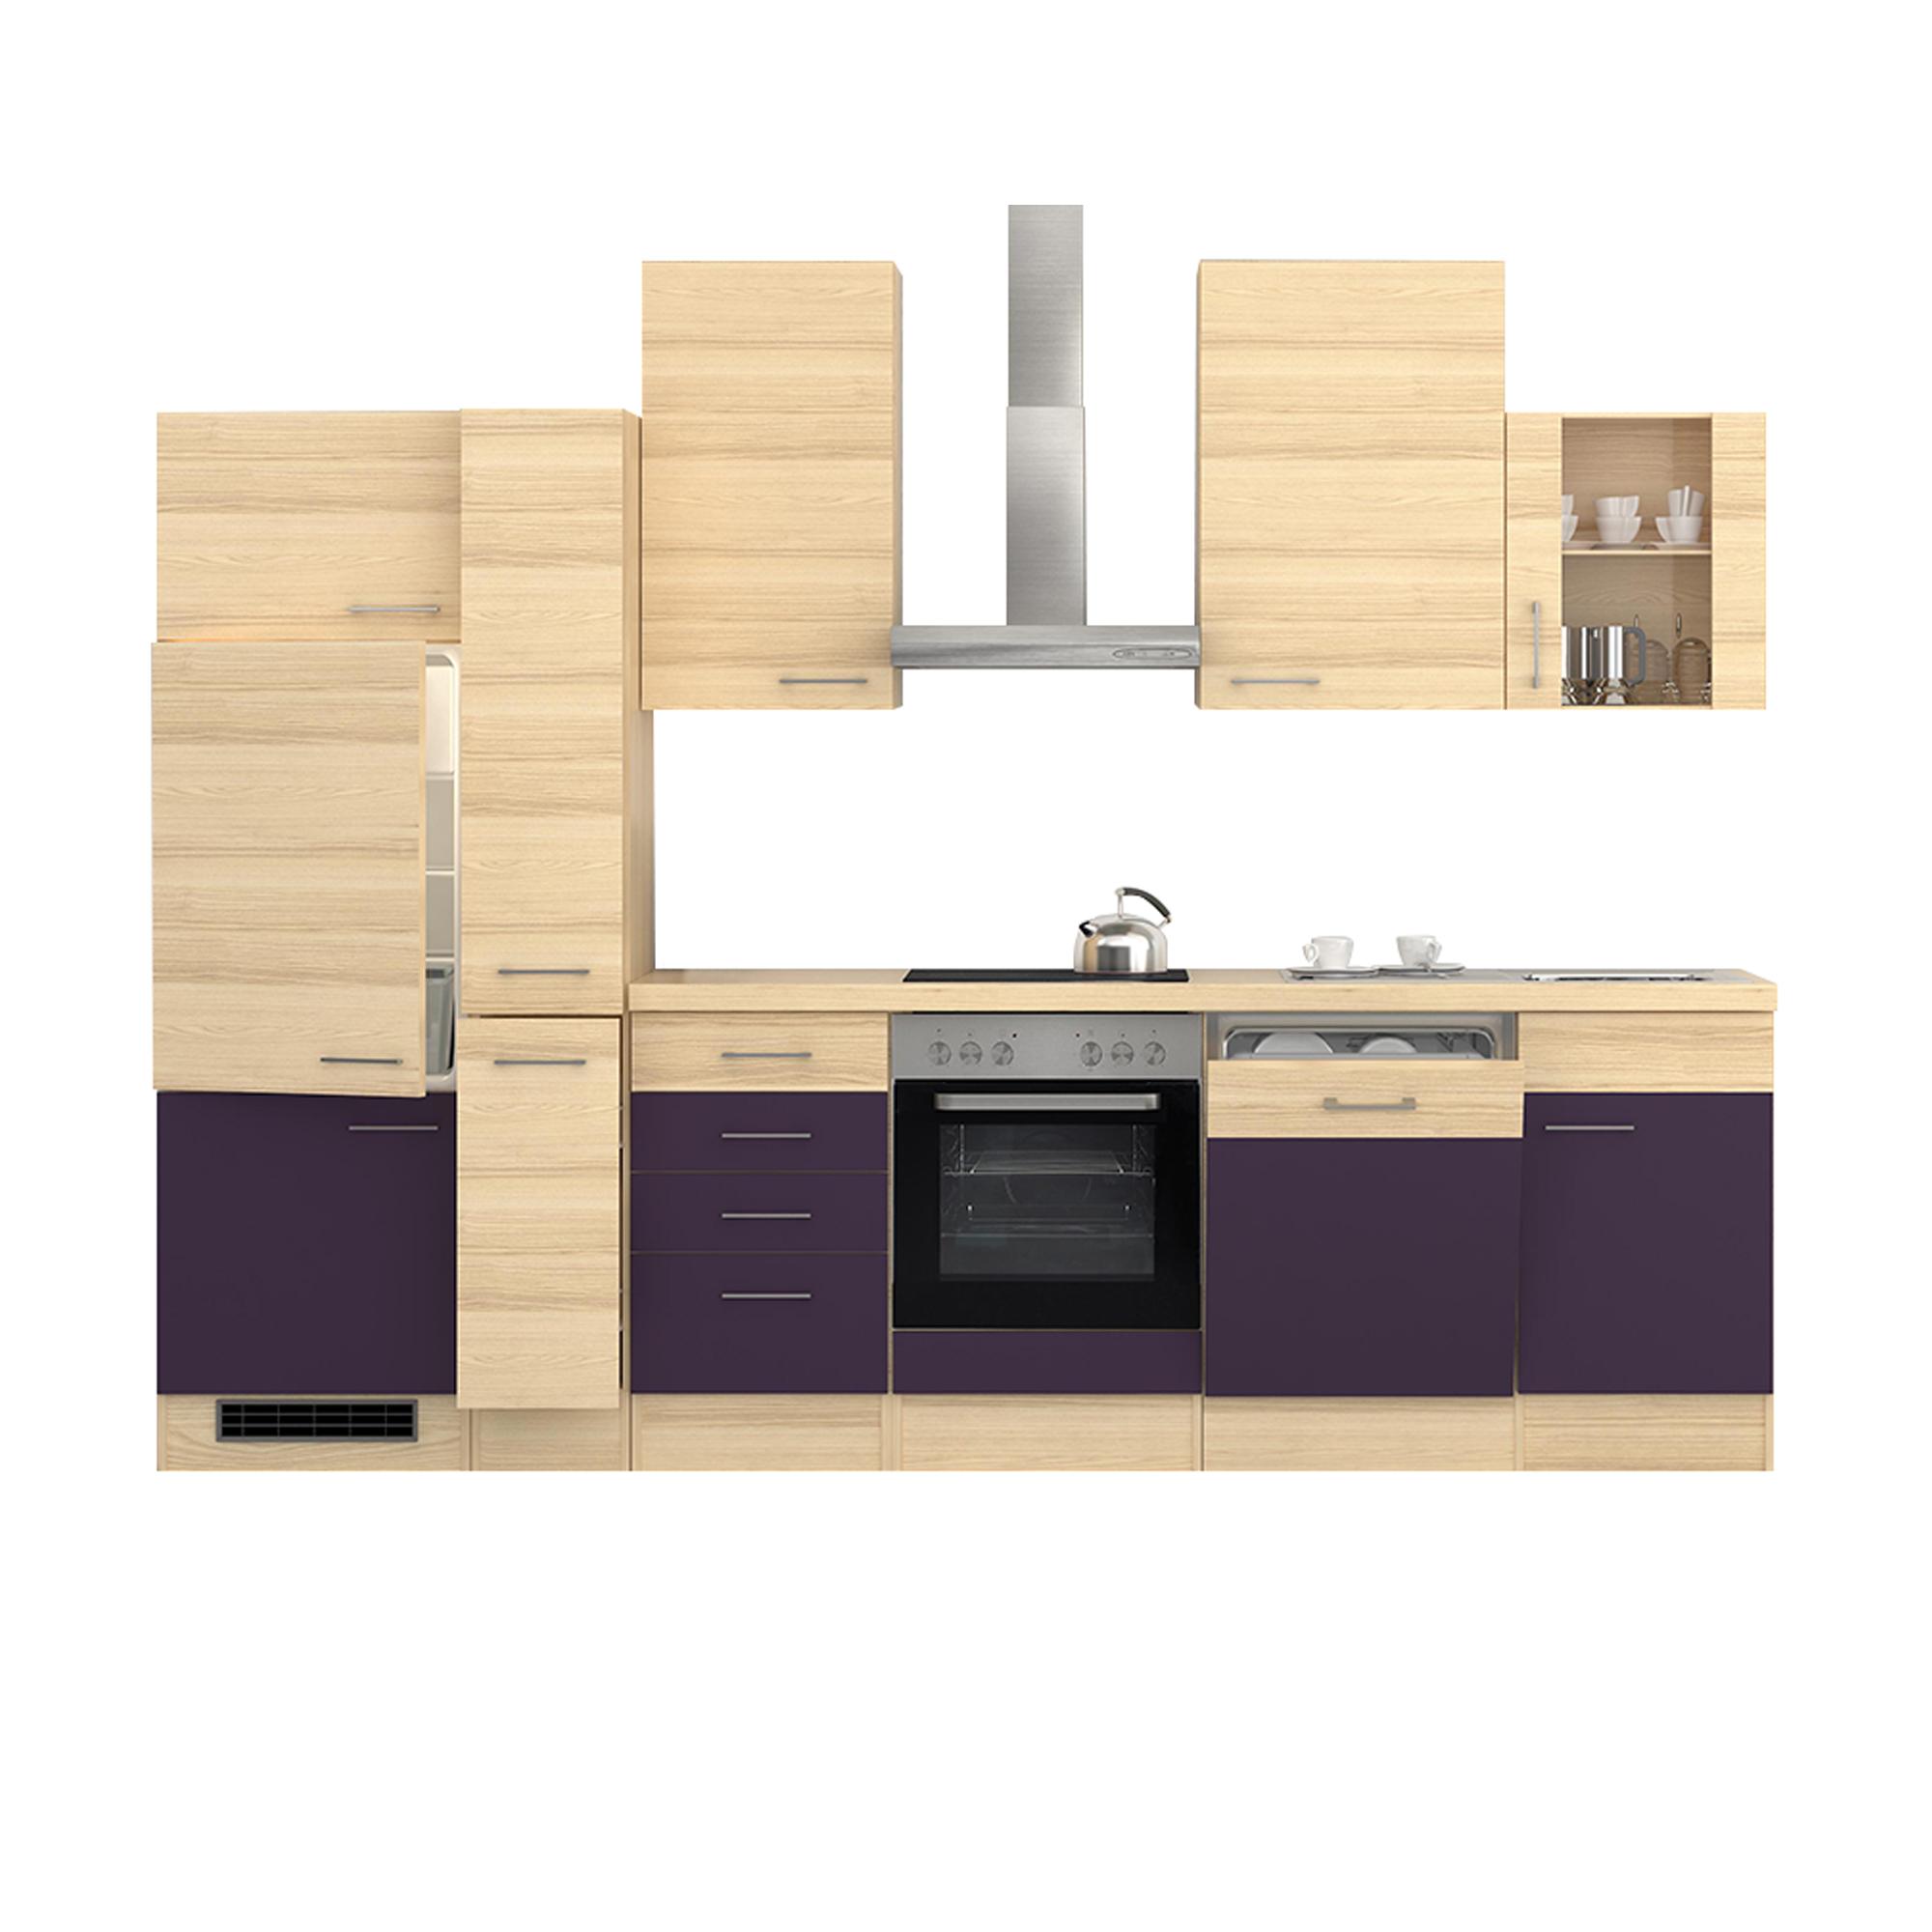 k chenzeile focus e ger te 1 glash nger 15 teilig breite 310 cm aubergine k che k chenzeilen. Black Bedroom Furniture Sets. Home Design Ideas